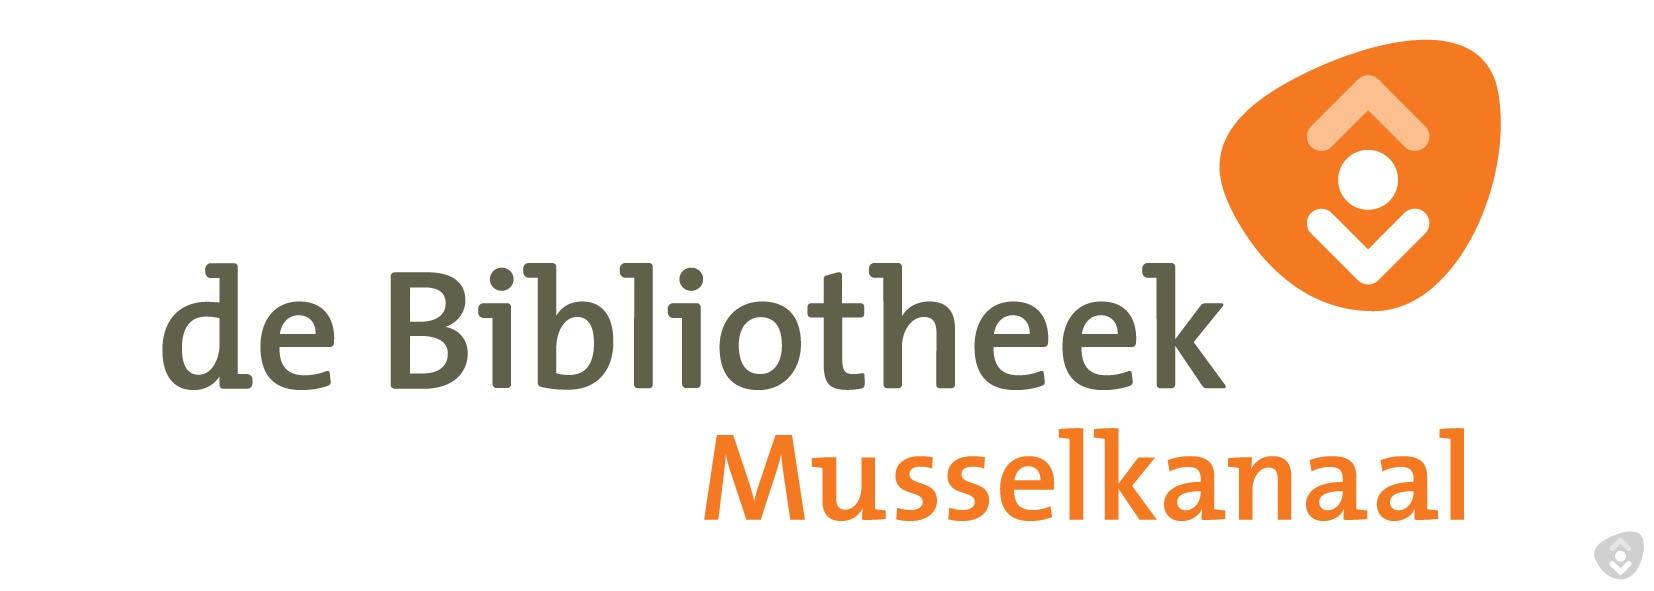 Logo Musselkanaal (131511 bytes)